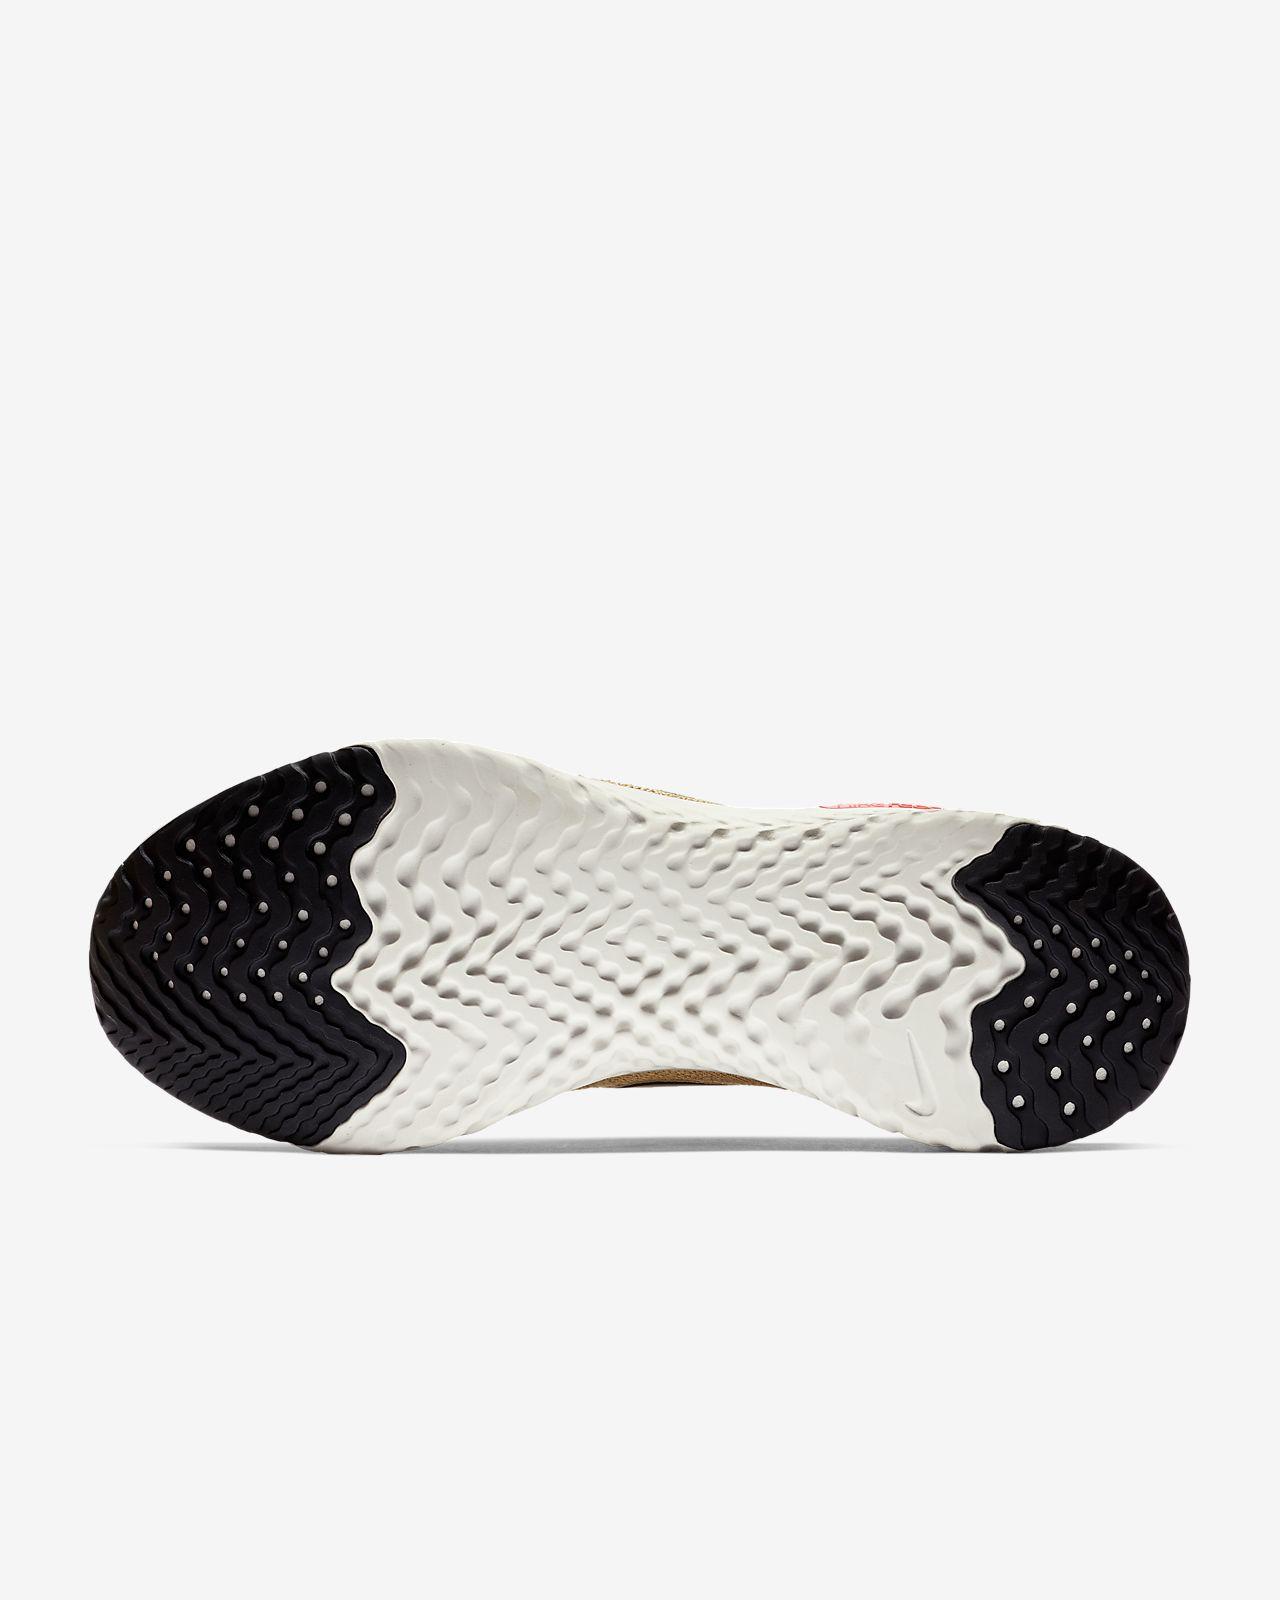 reputable site 59528 8c158 ... Nike Epic React Flyknit 2 Men s Running Shoe